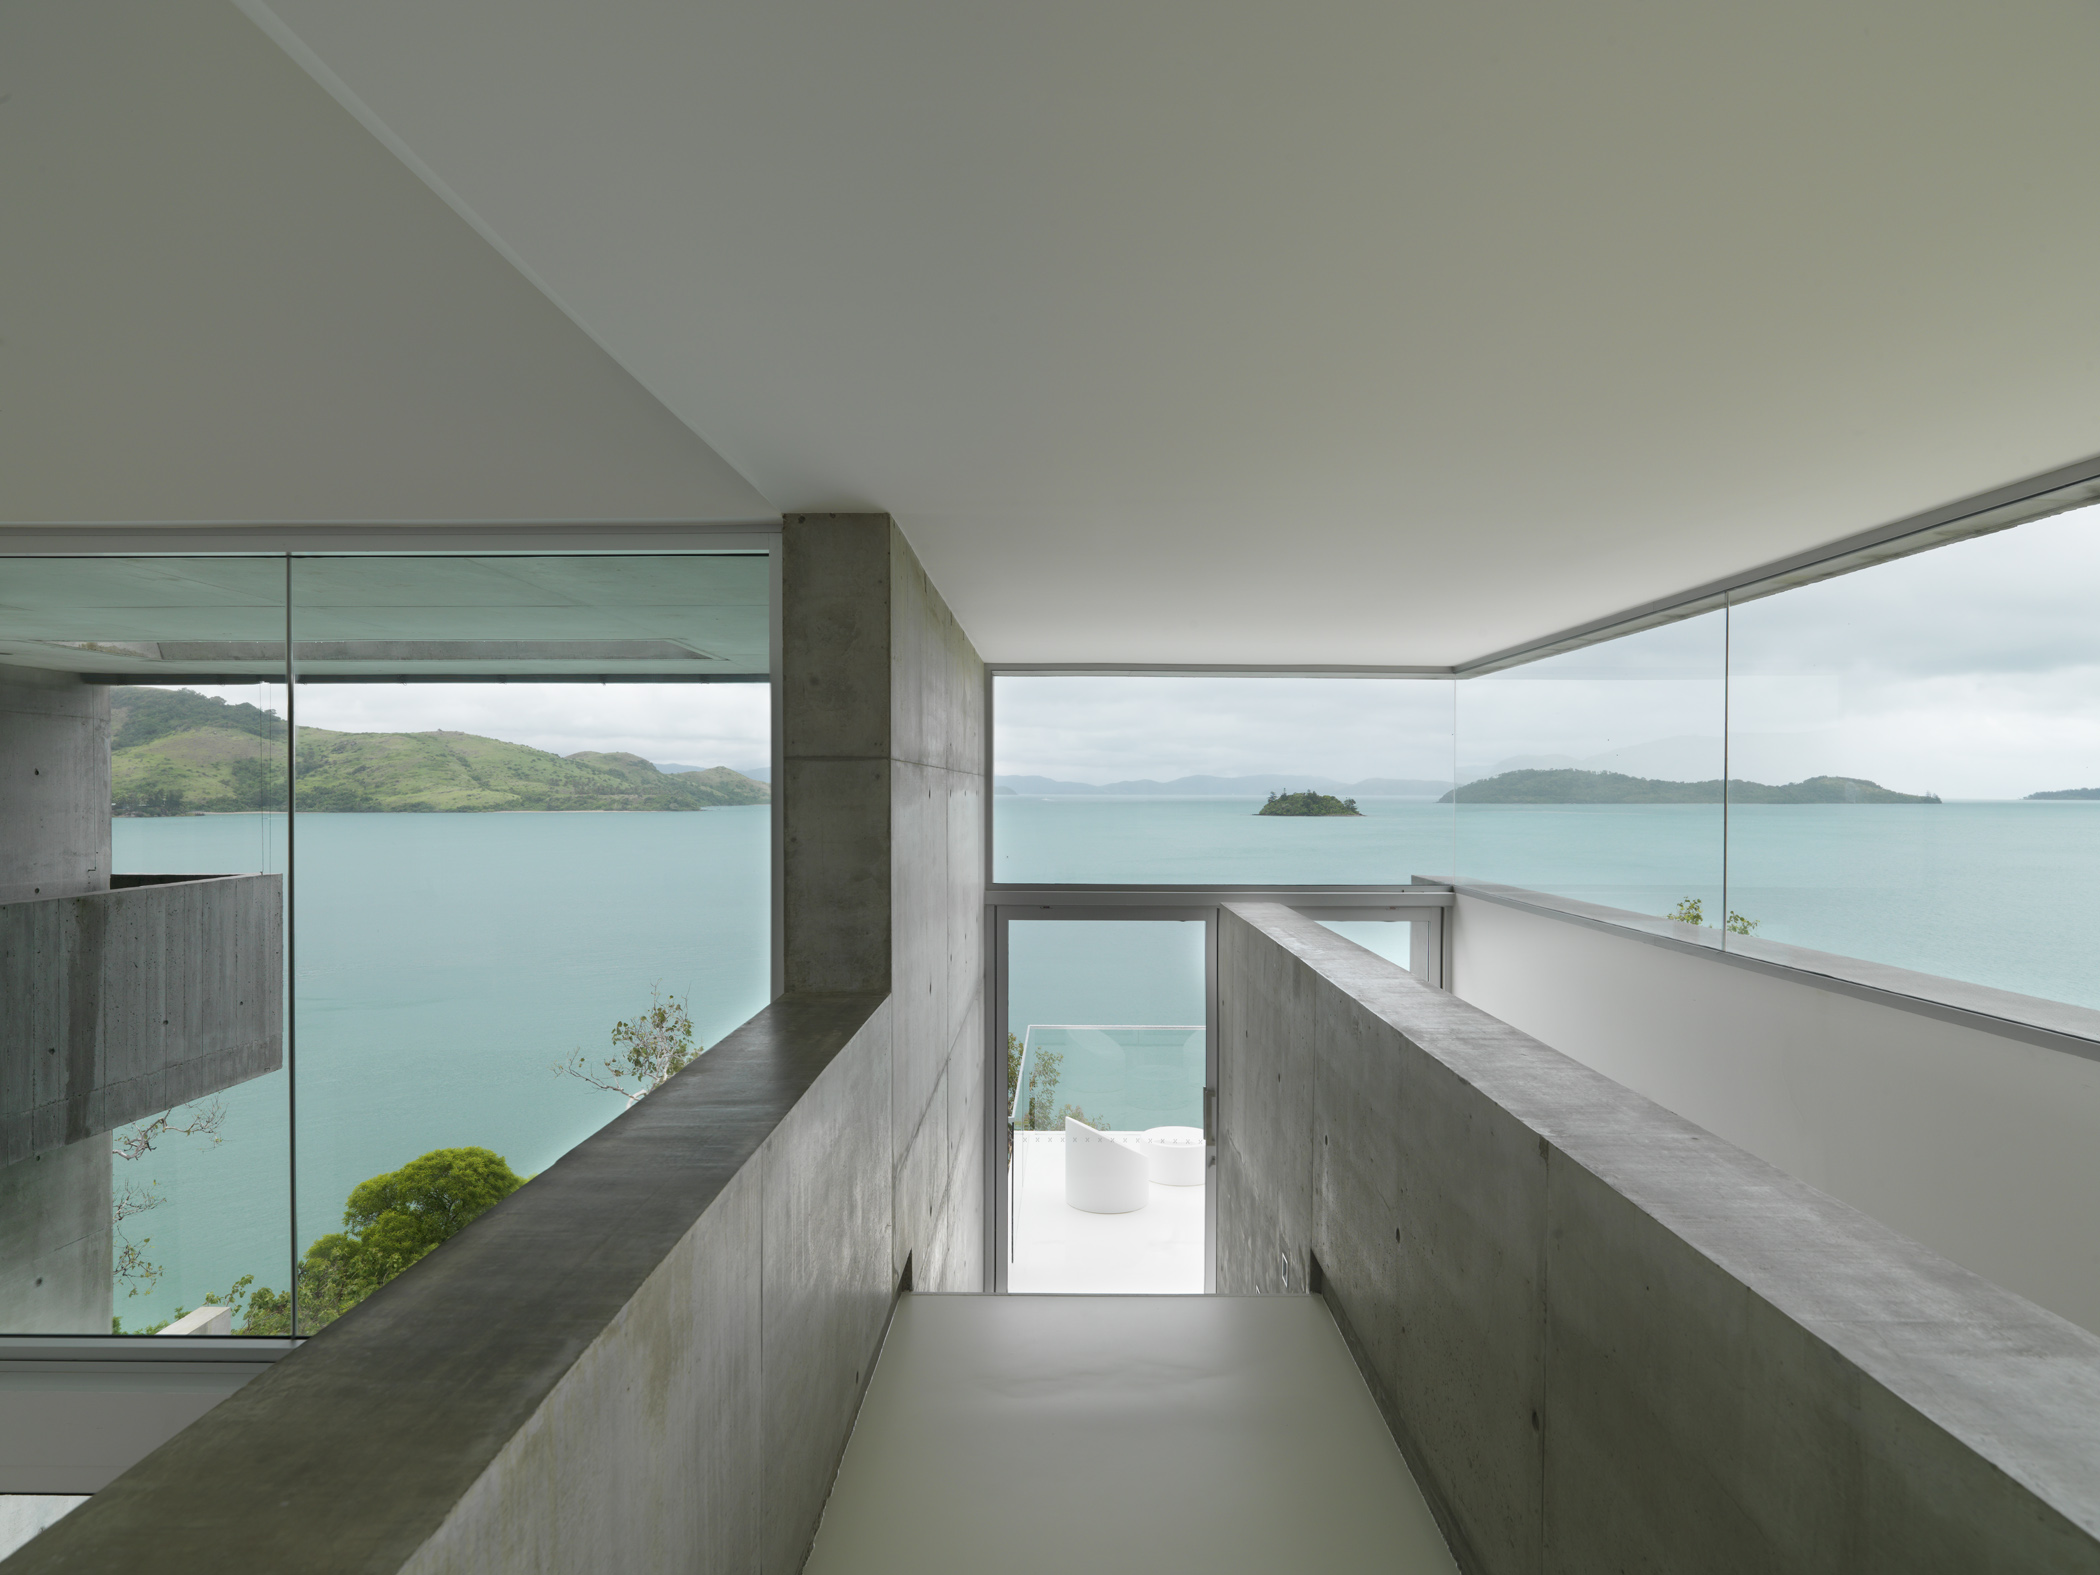 Solis architectual_1222255 copy.jpg